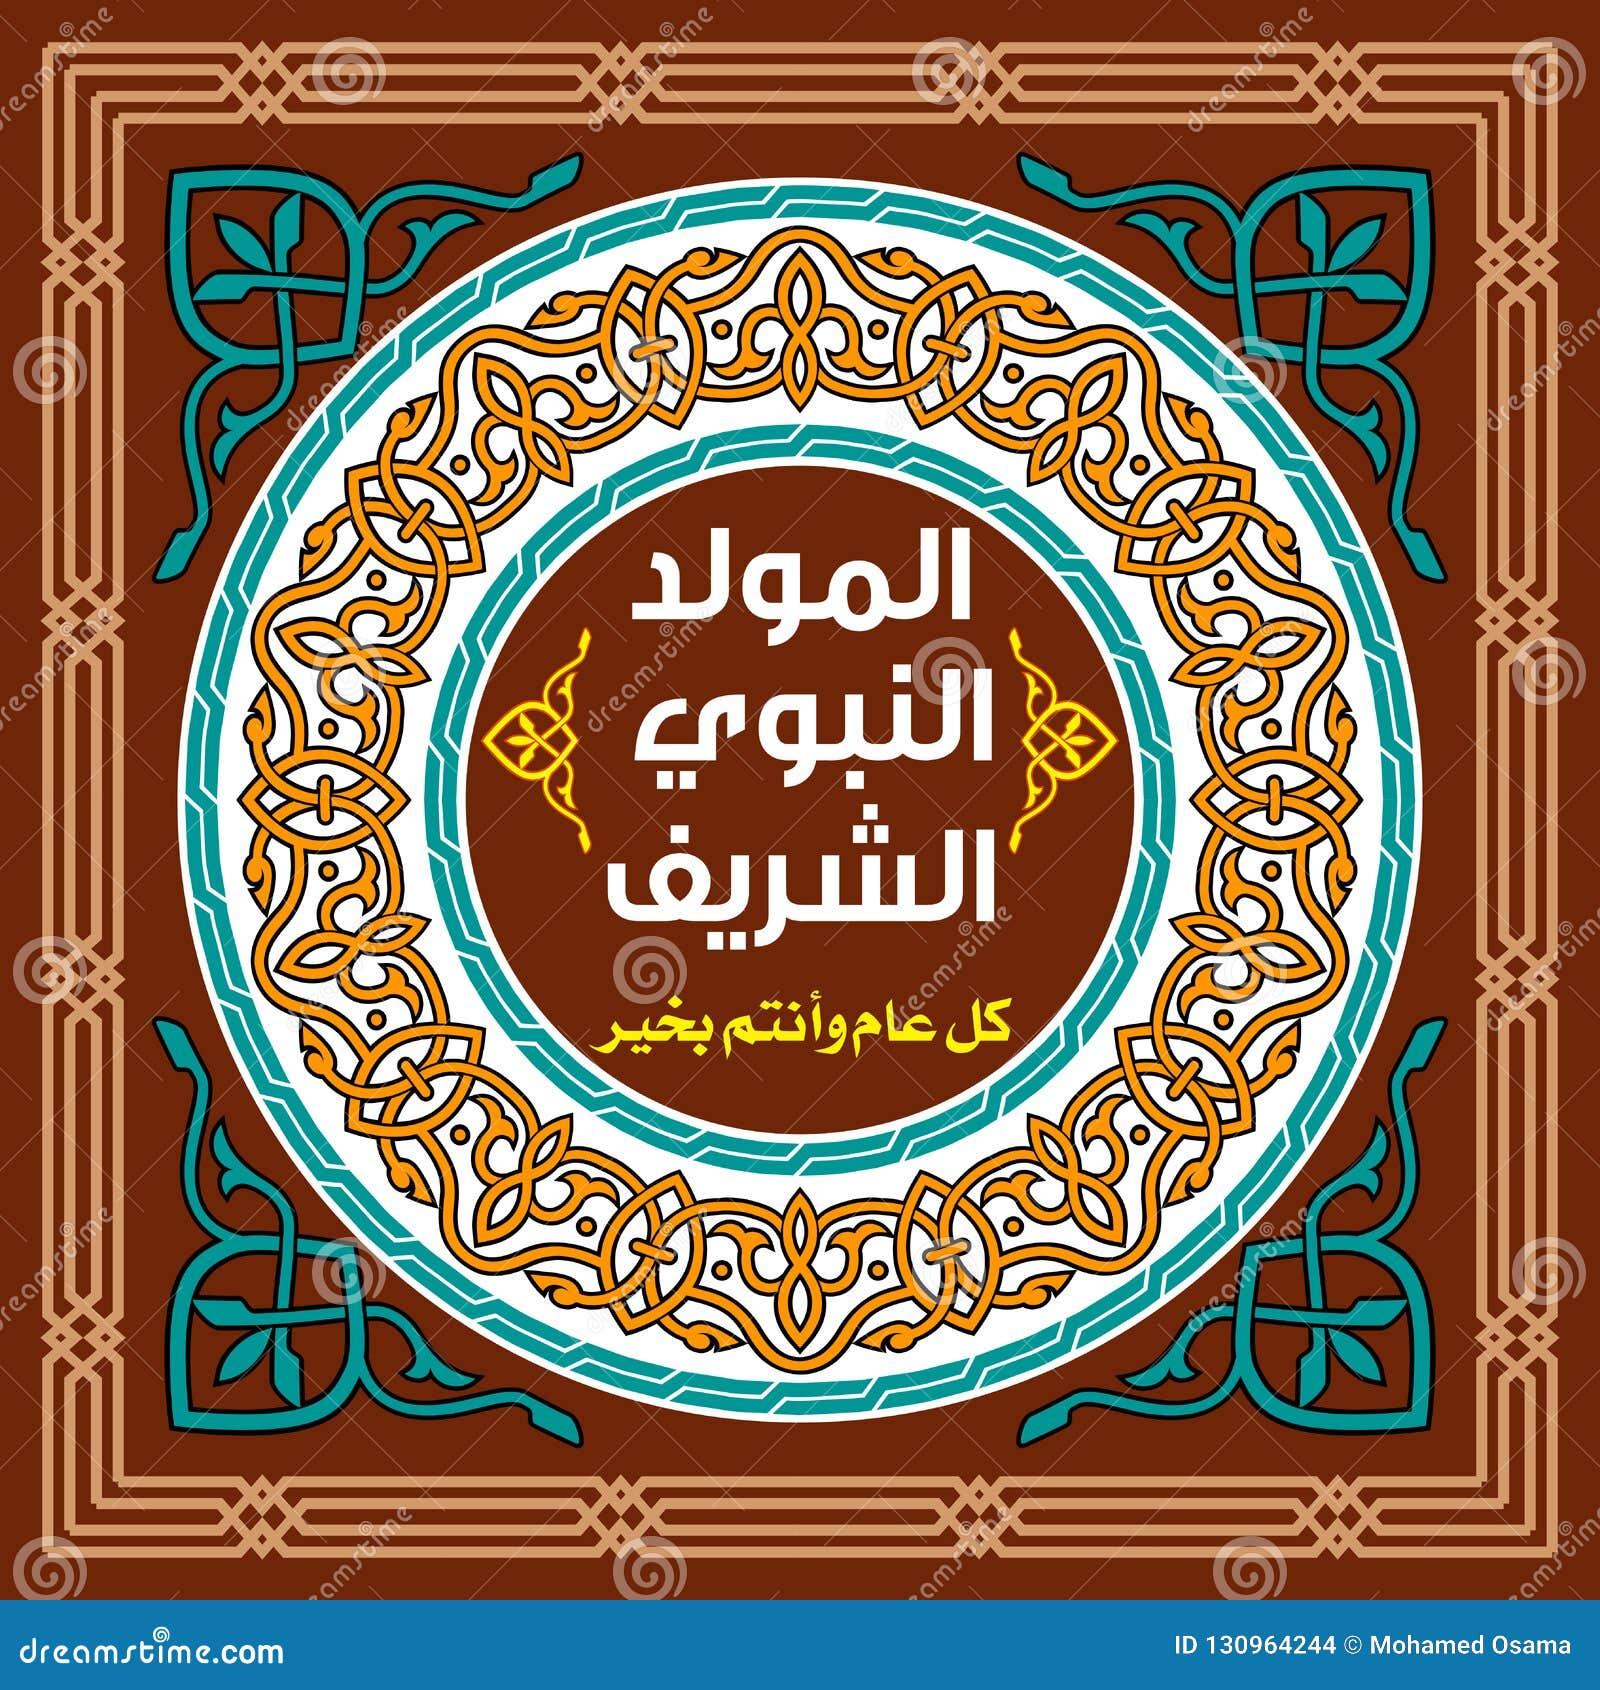 Congratulation Card of Islamic Mawlid Holiday, Saying Happy New